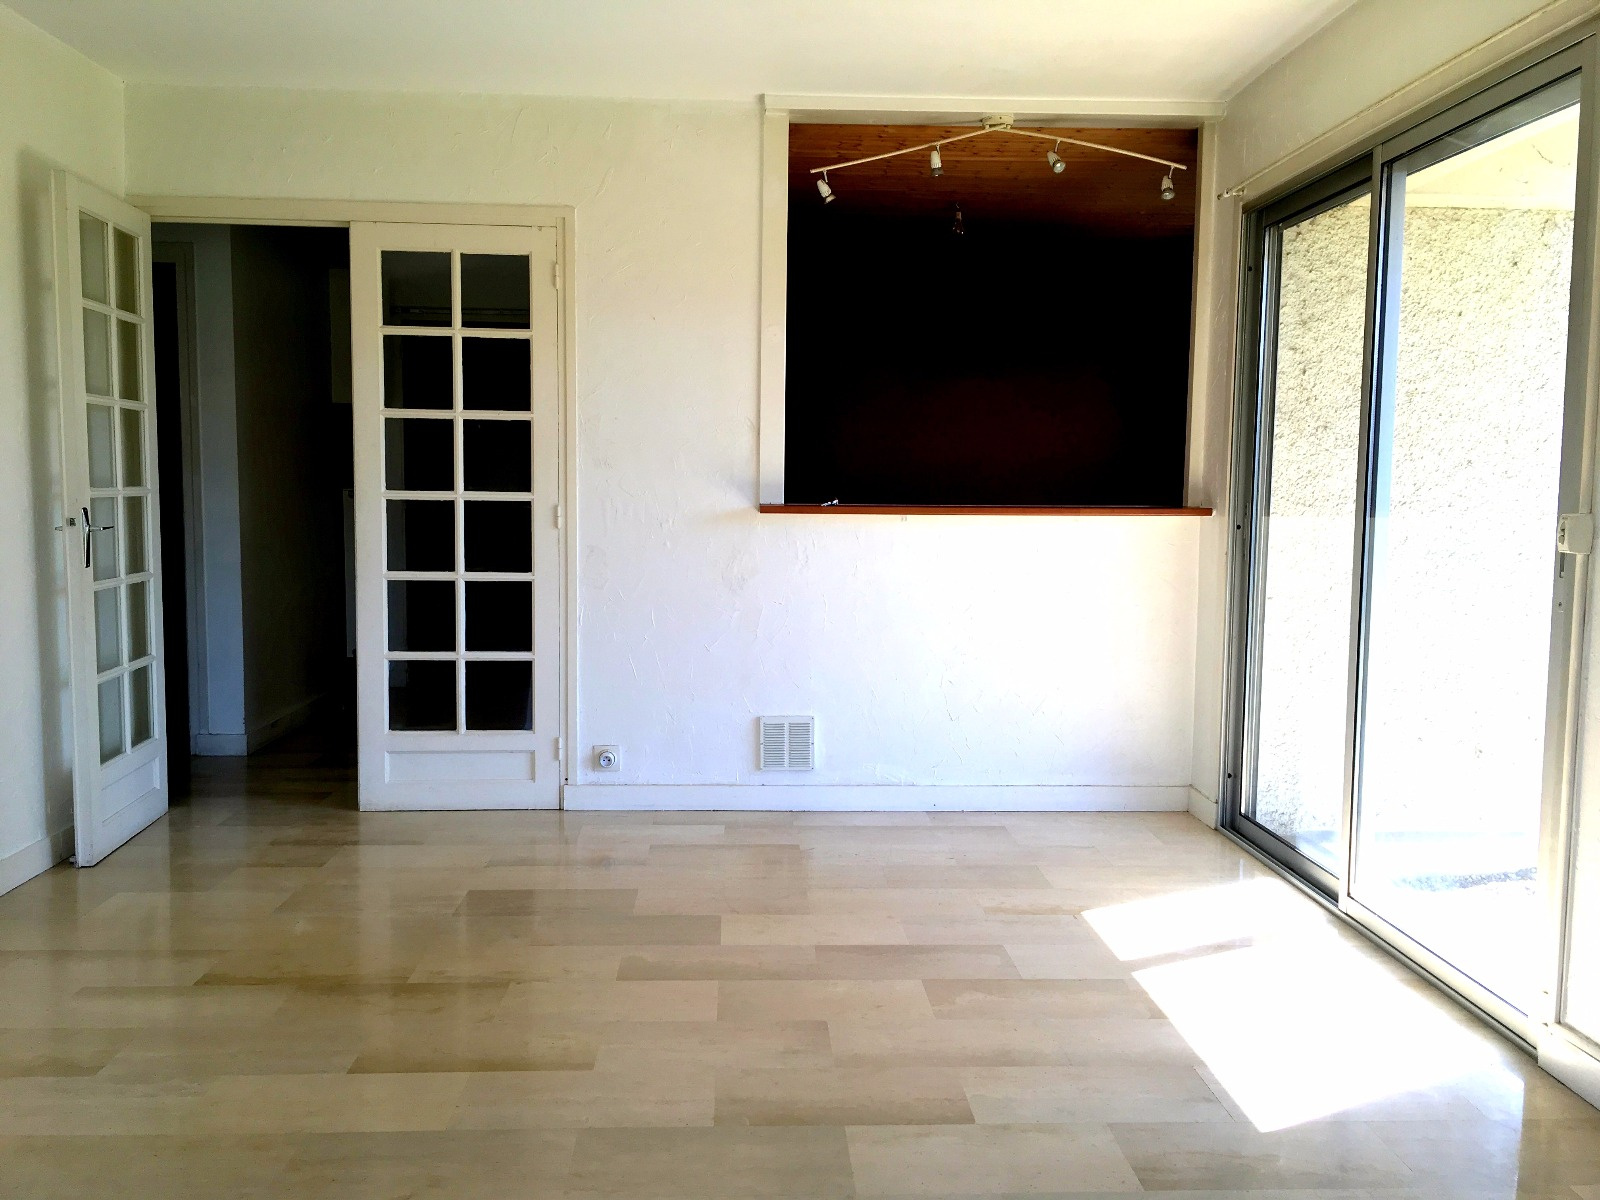 annonce vente appartement valence 26000 106 000 992737061683. Black Bedroom Furniture Sets. Home Design Ideas